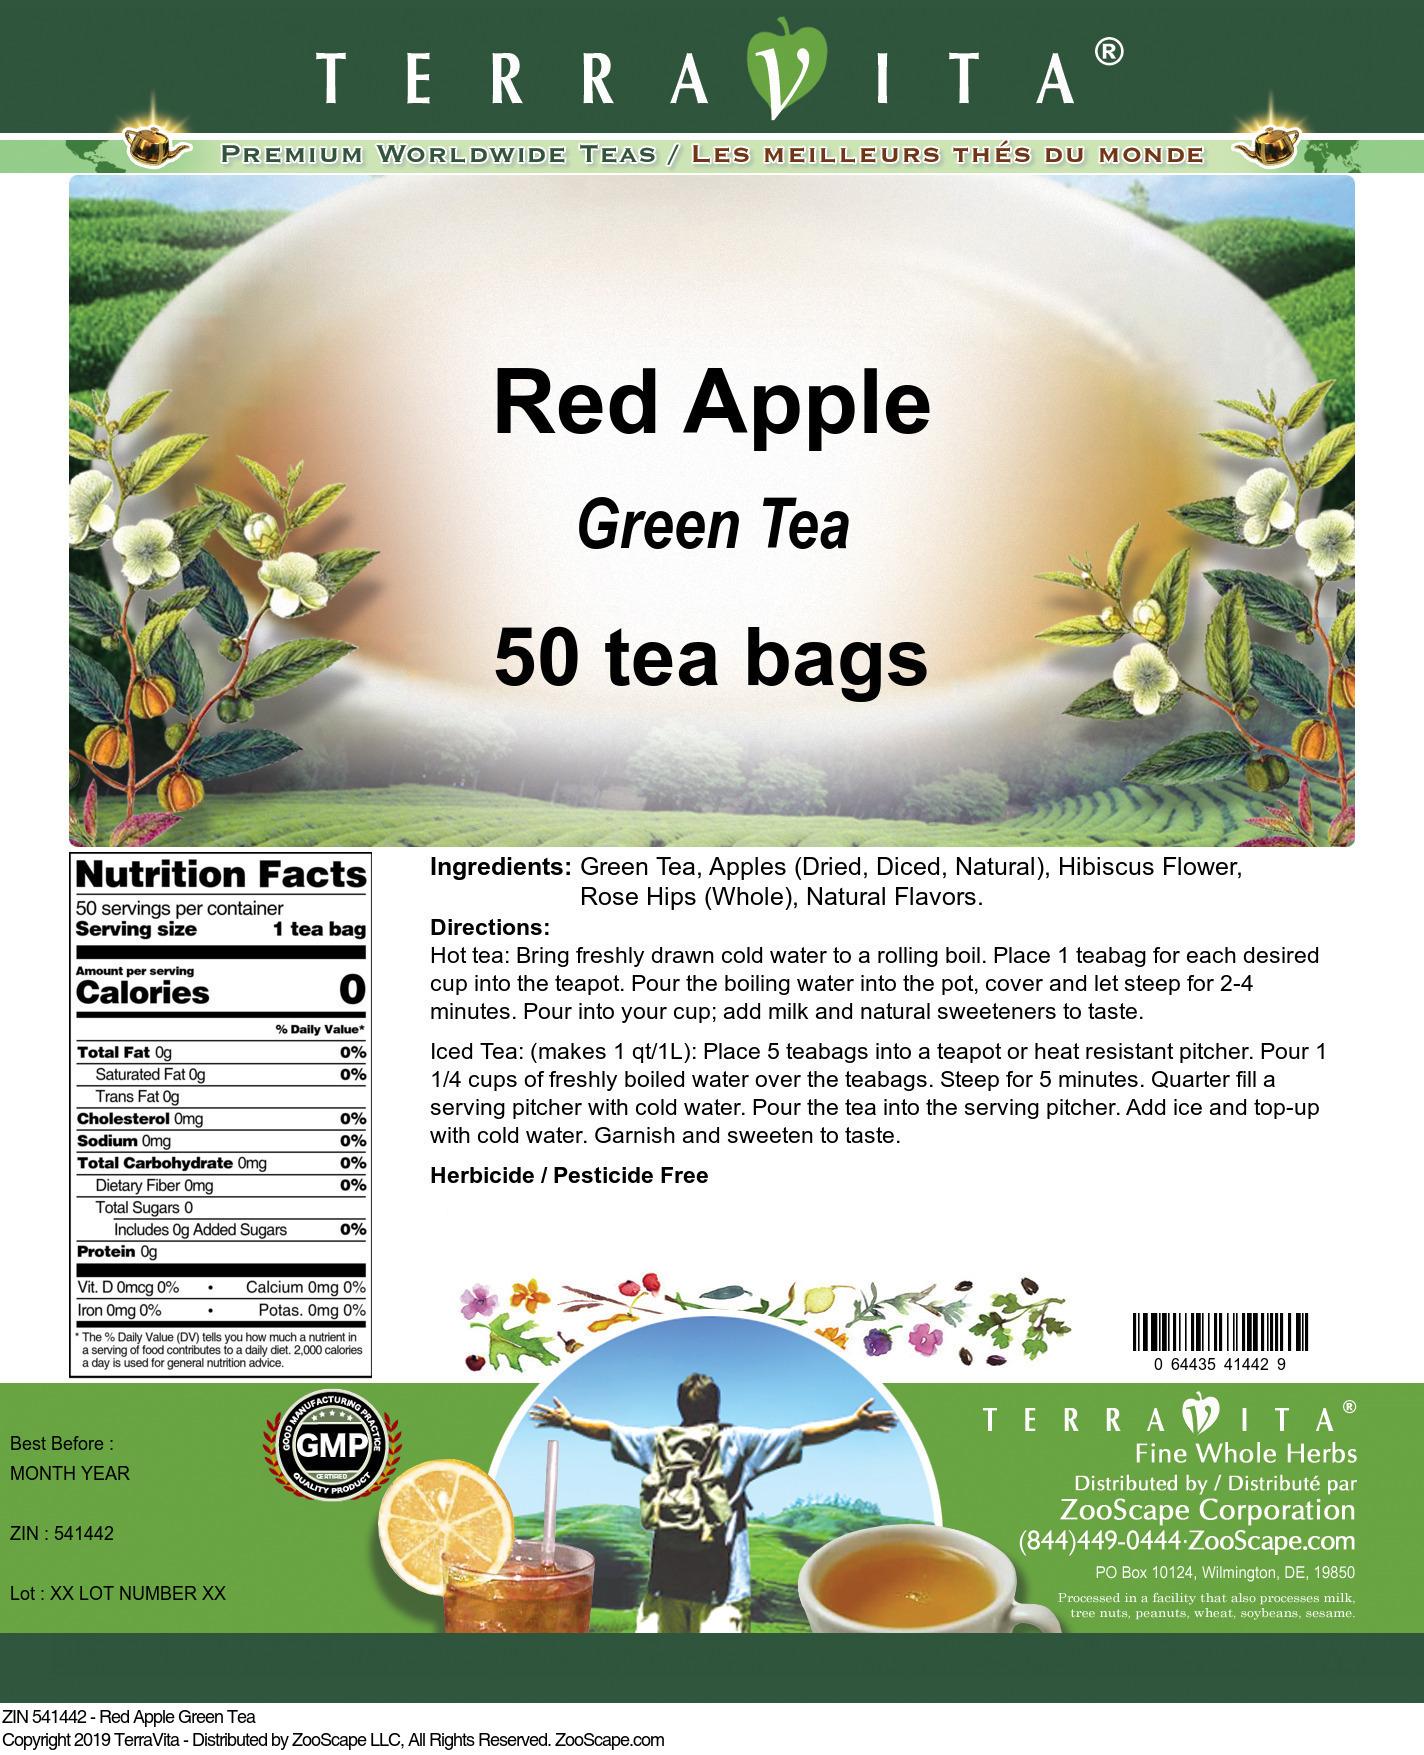 Red Apple Green Tea